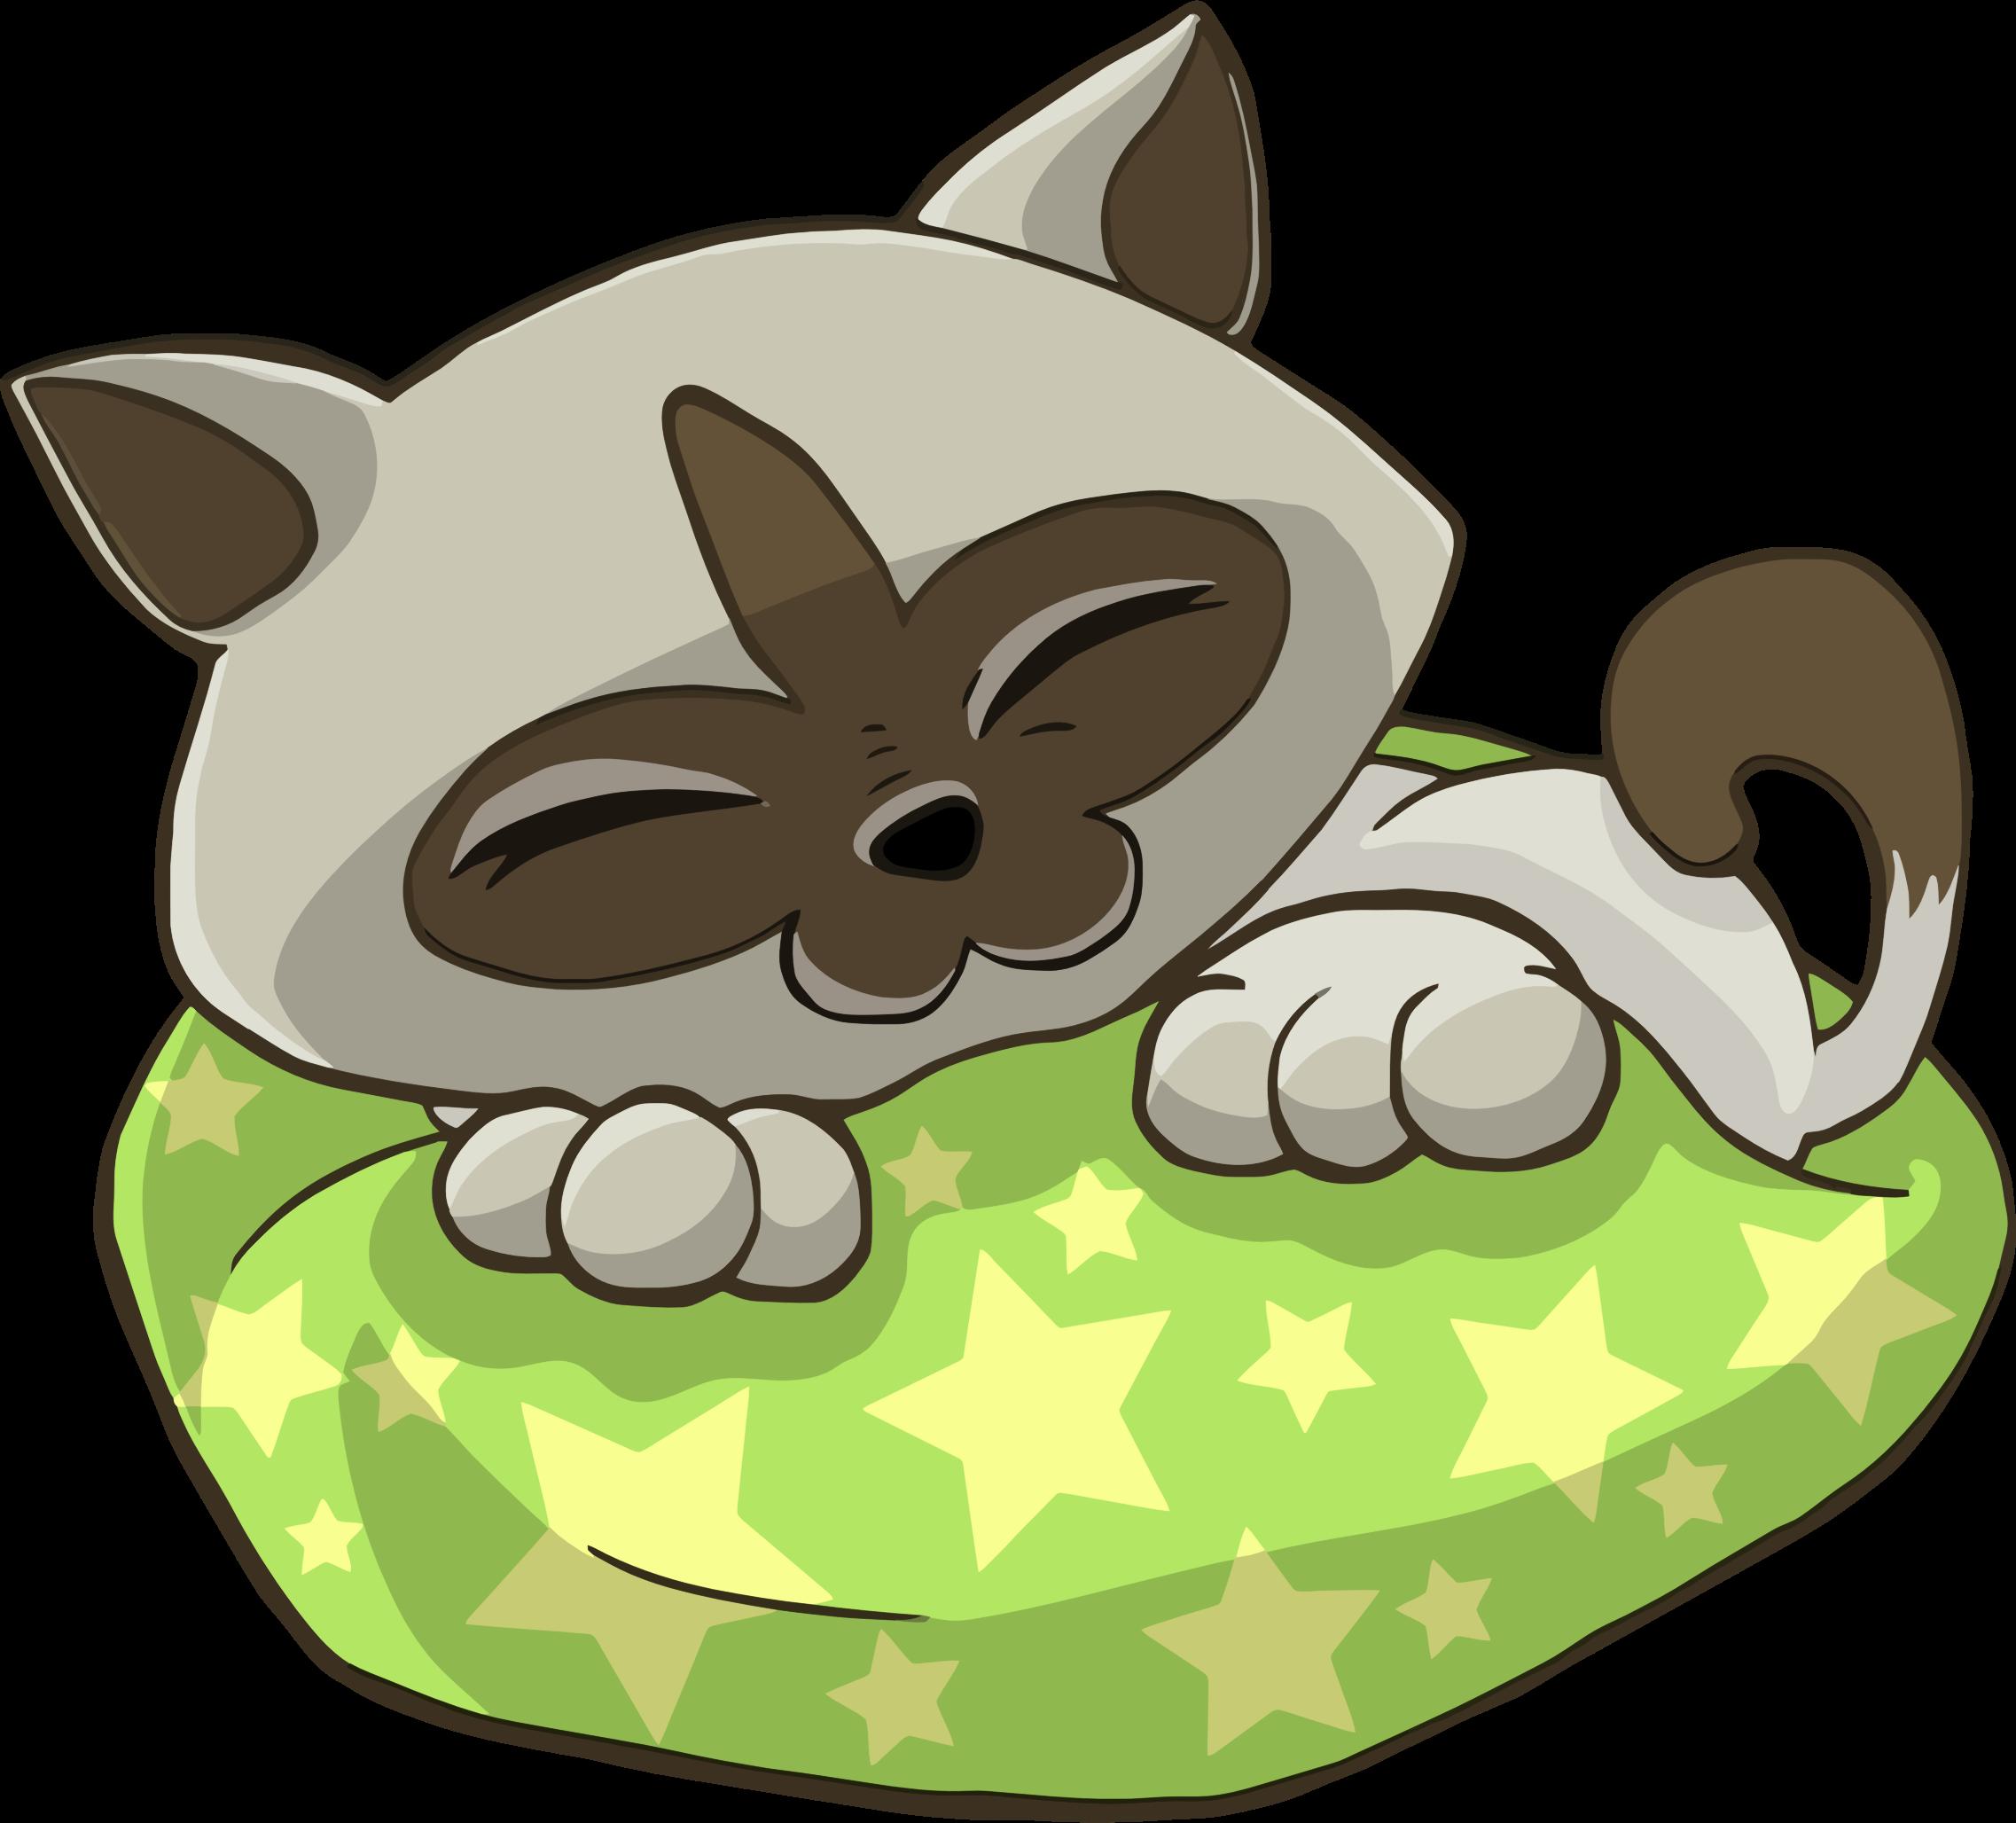 clip art black and white stock Sleeping on starry pillow. Clipart kitten